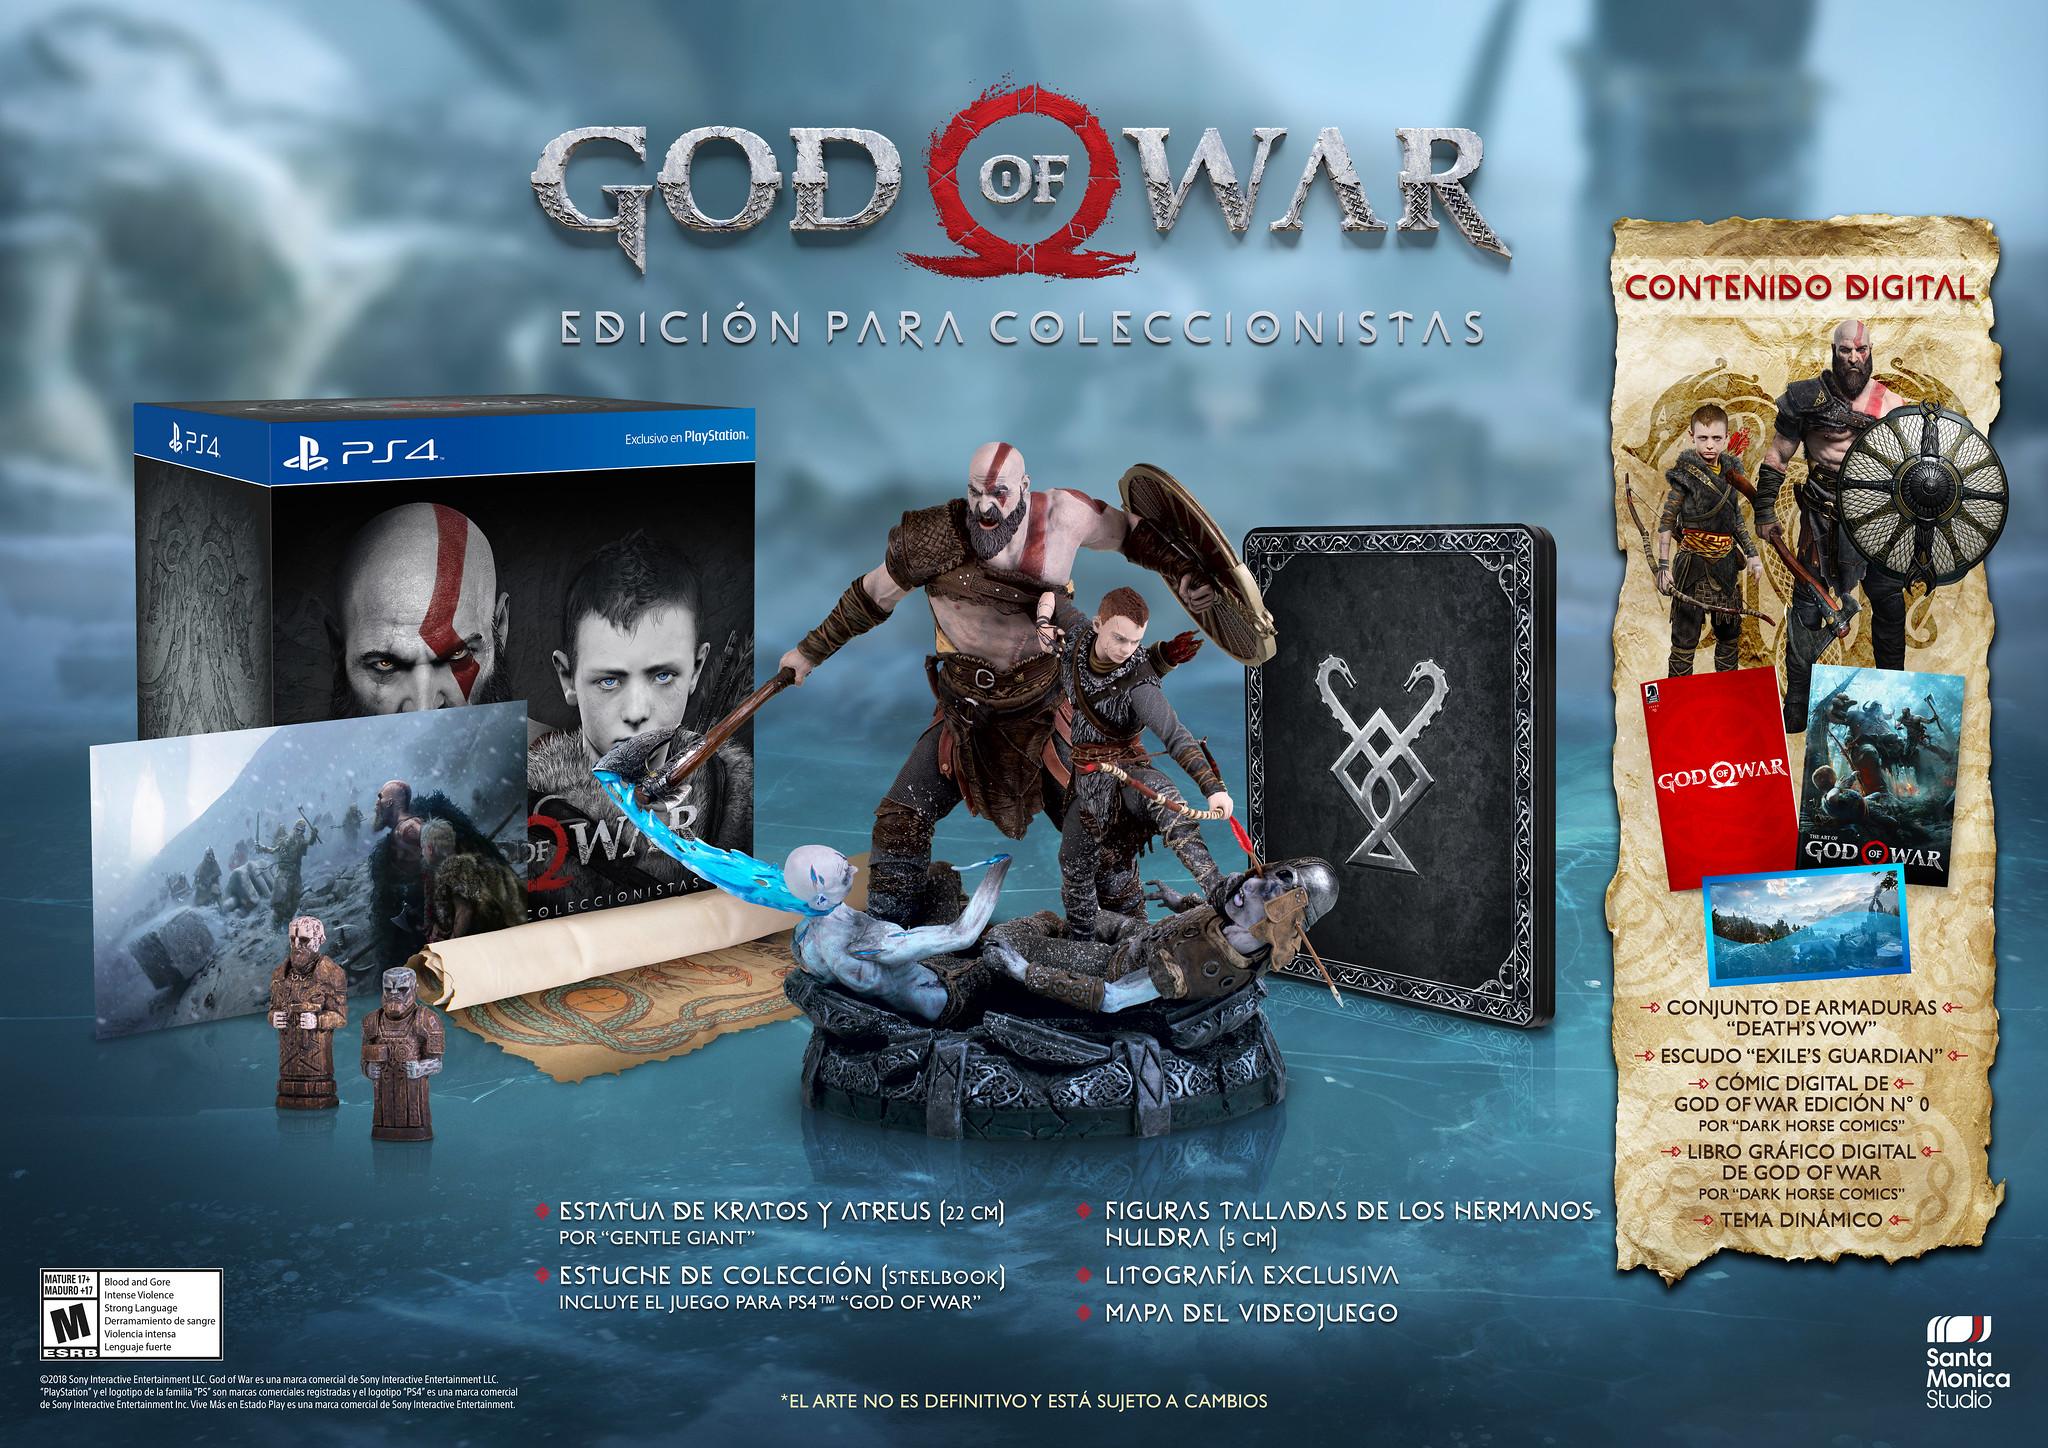 God of War: Nuestra Collector Edition